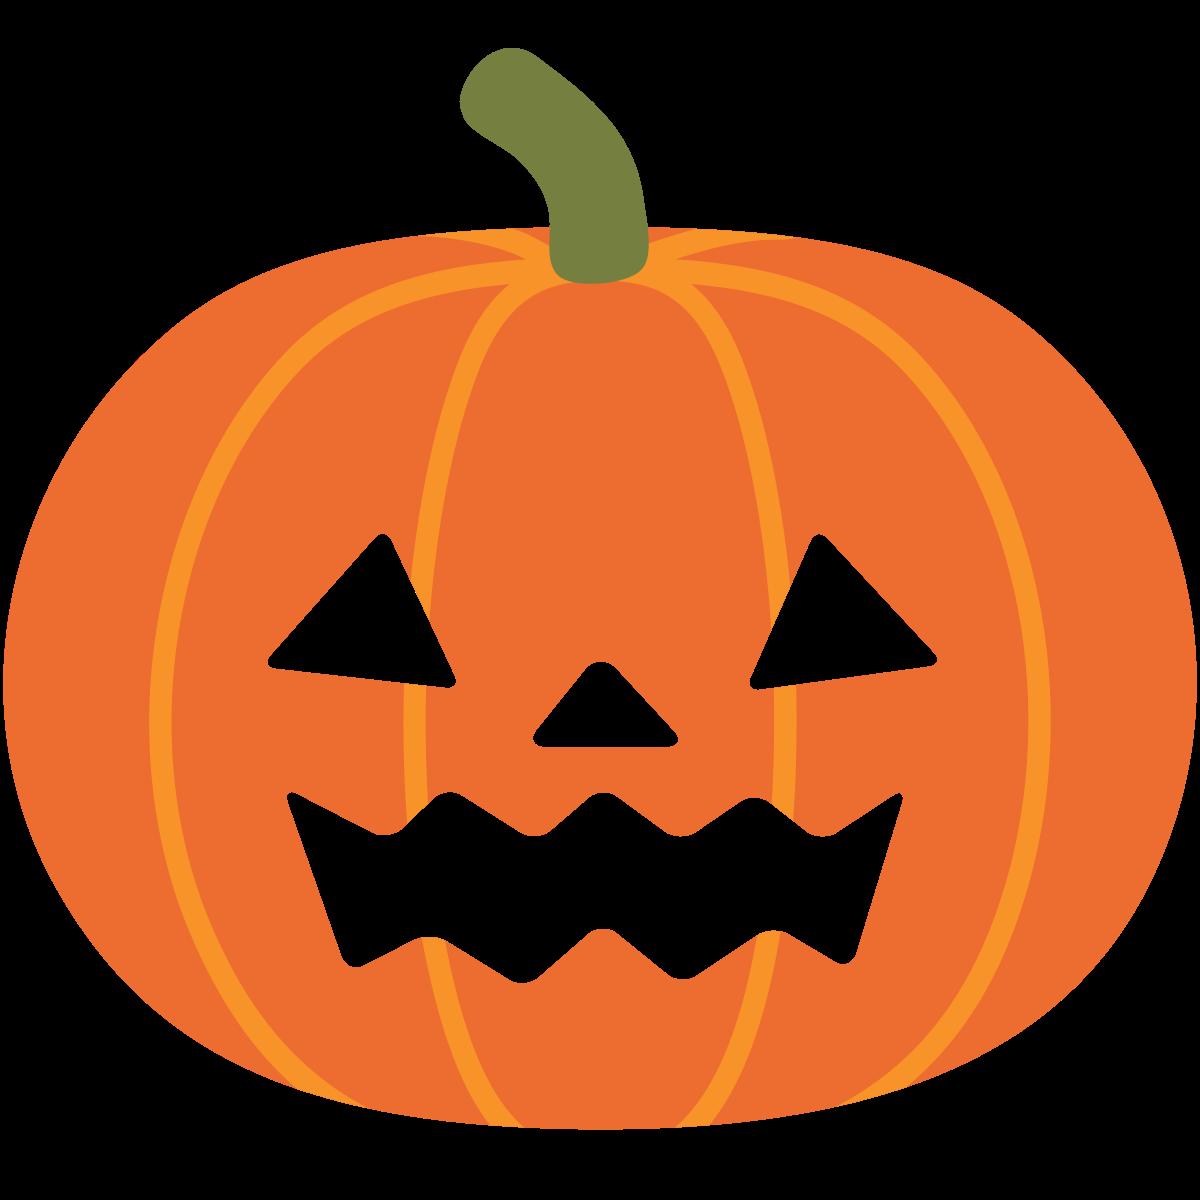 Pumpkin emoji clipart graphic  graphic